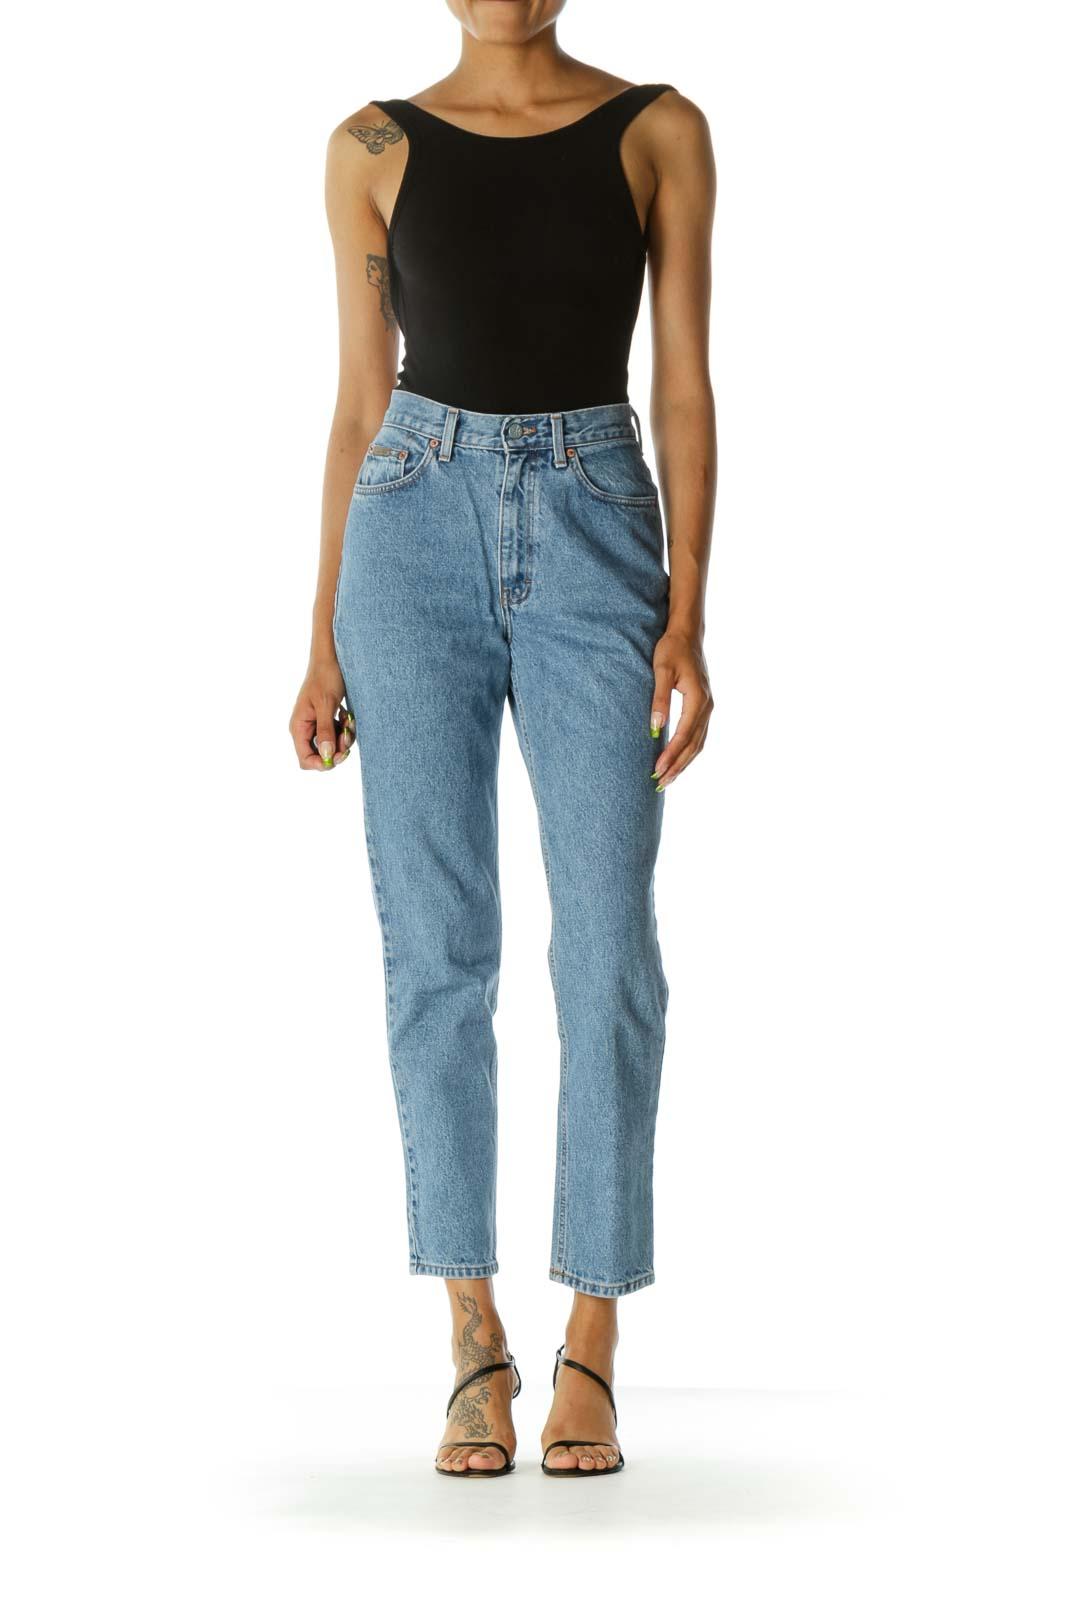 Blue Light Wash 100% Cotton High-Waist Denim Jeans